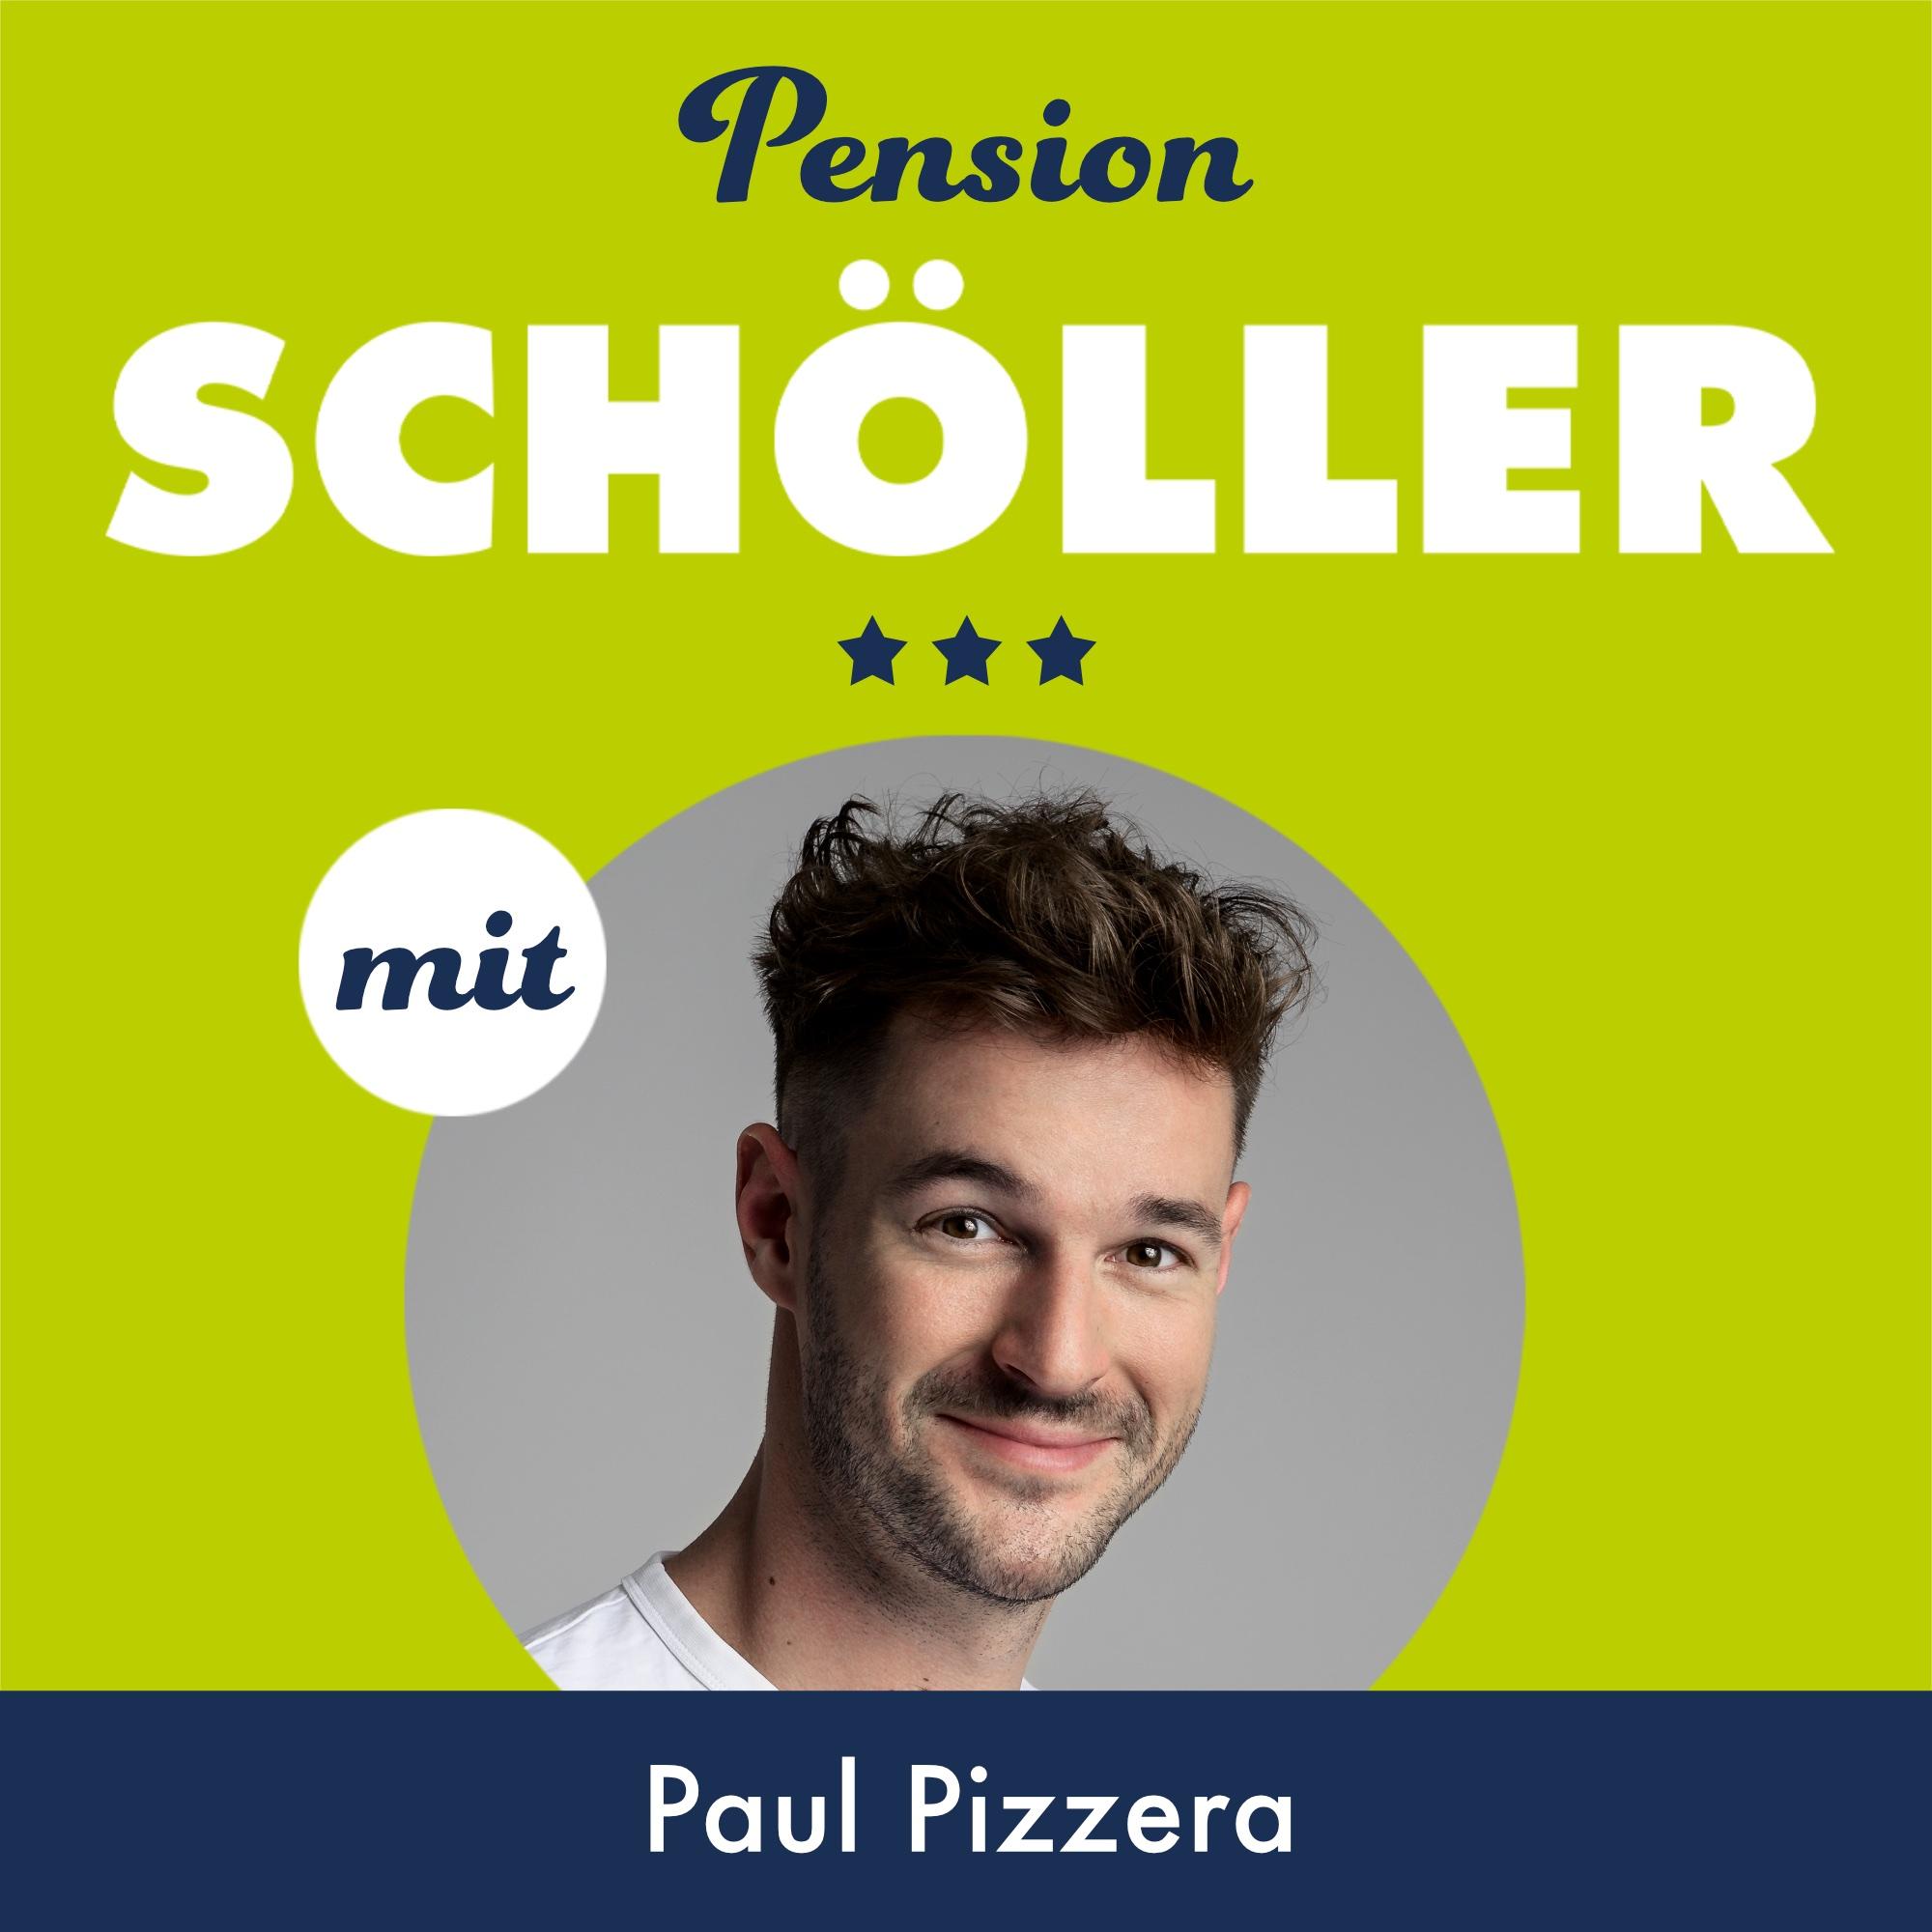 #15 Paul Pizzera